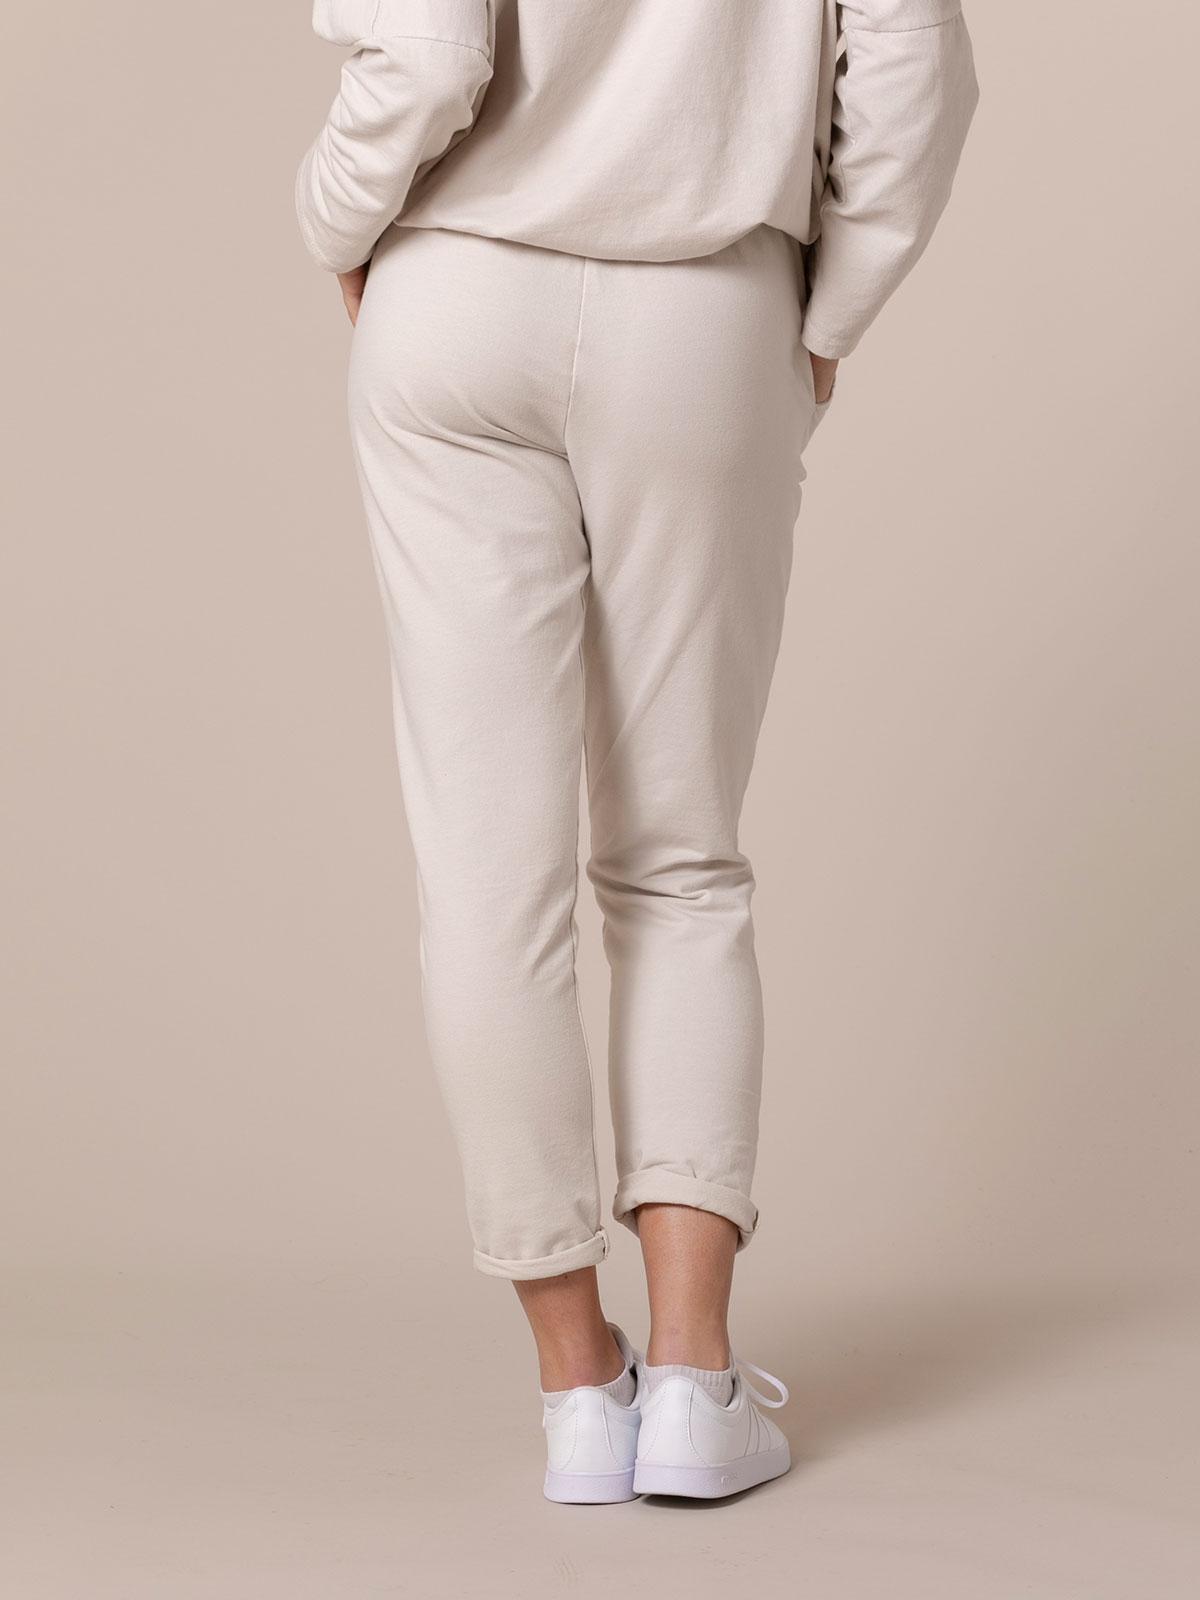 Pantalón mujer sport felpa Beige